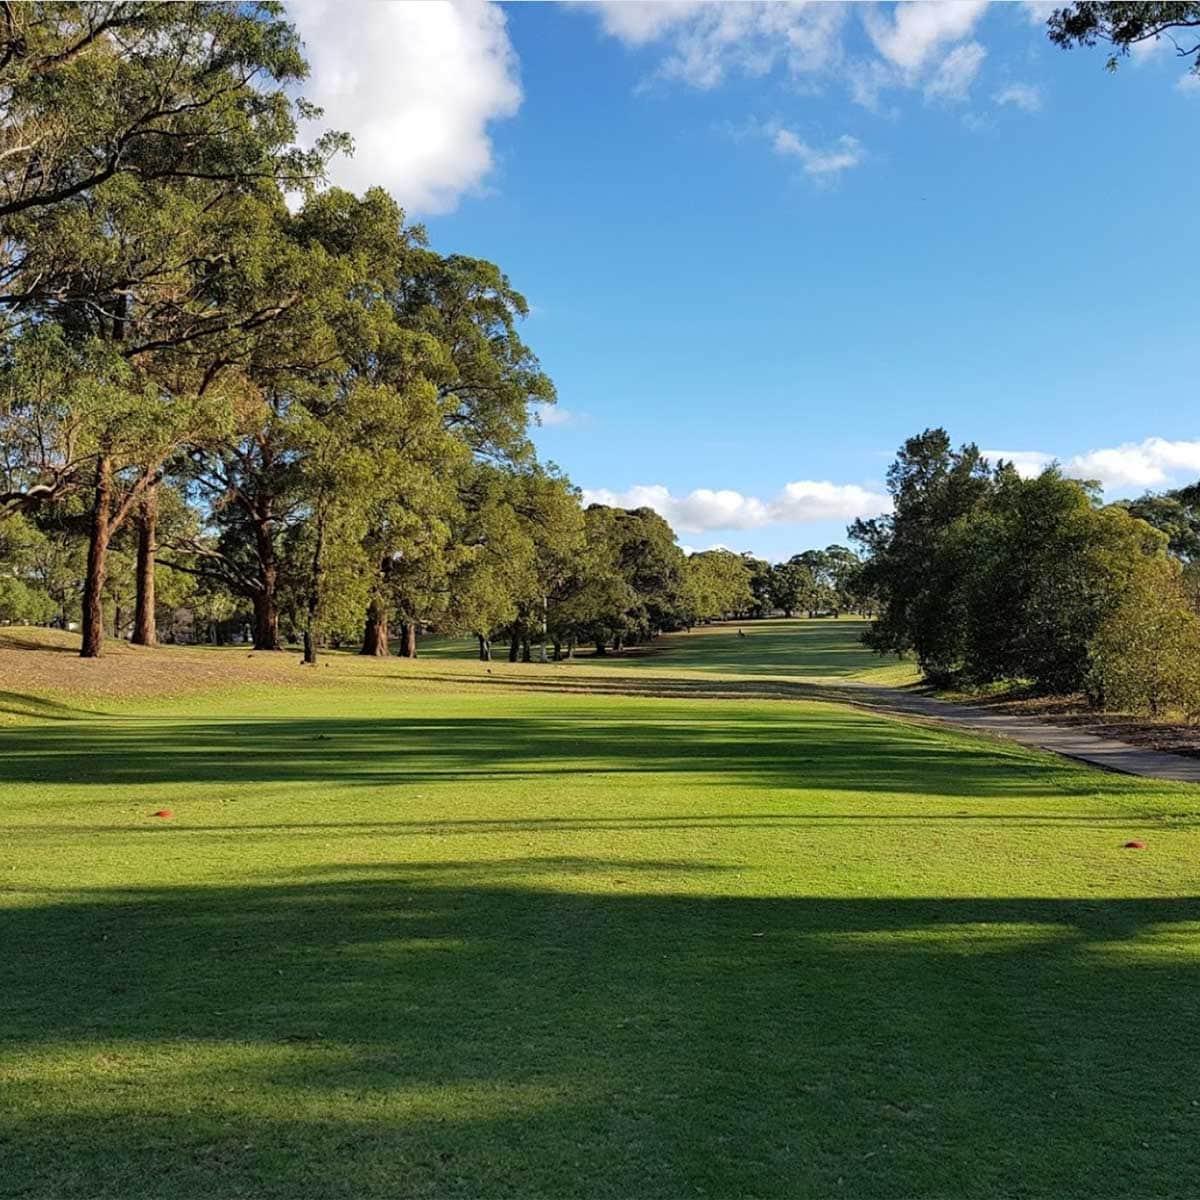 scenes from the Carnarvon Golf Club